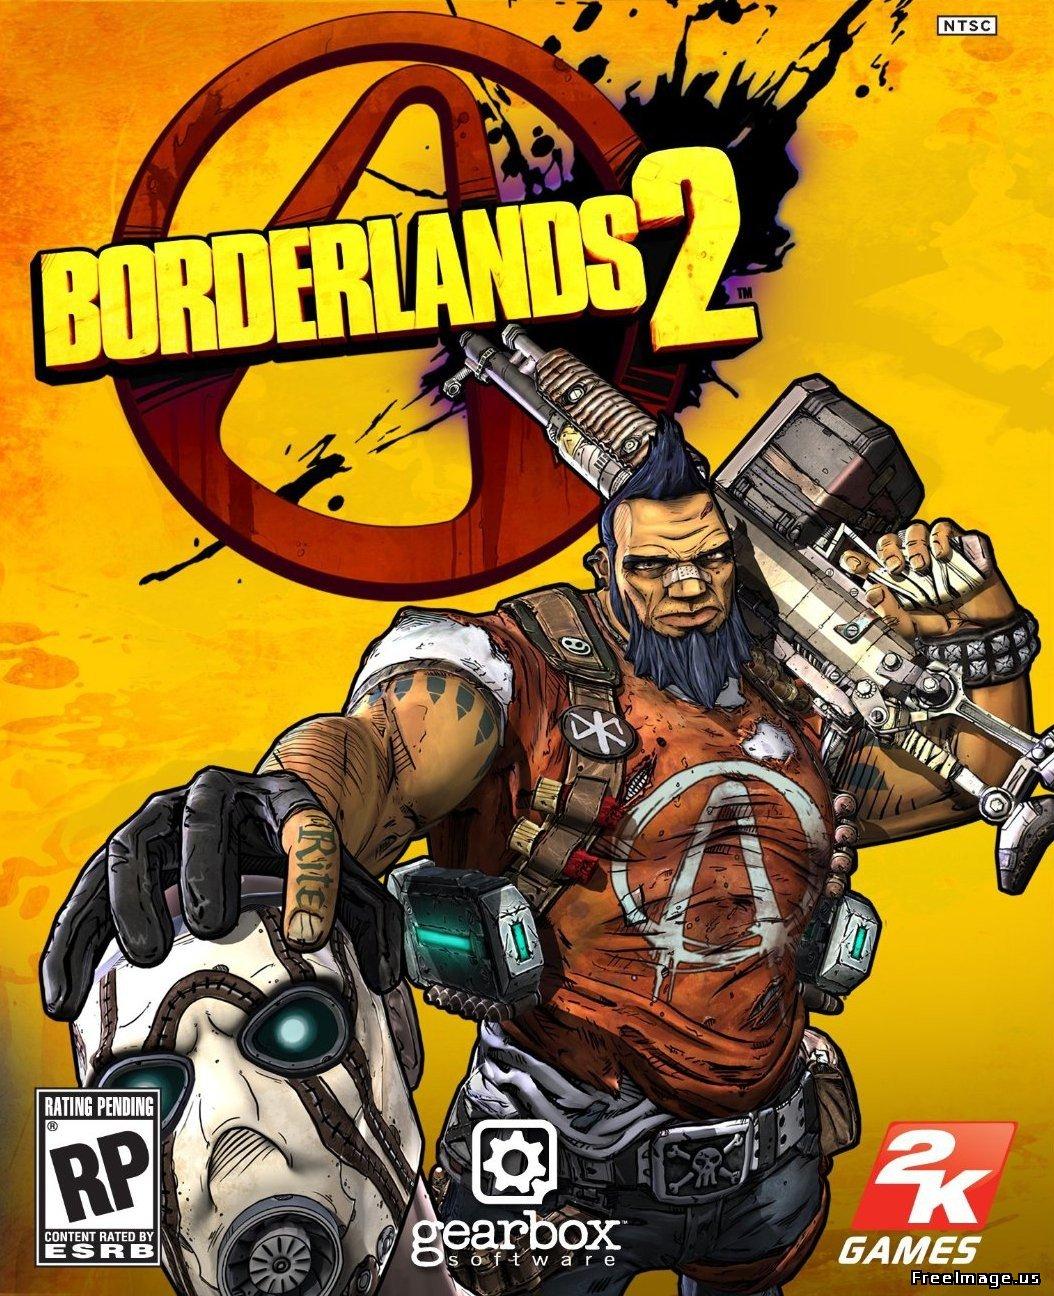 Borderlands 2 Xbox 360 Game Free Download ~ Full Games' House Borderlands 2